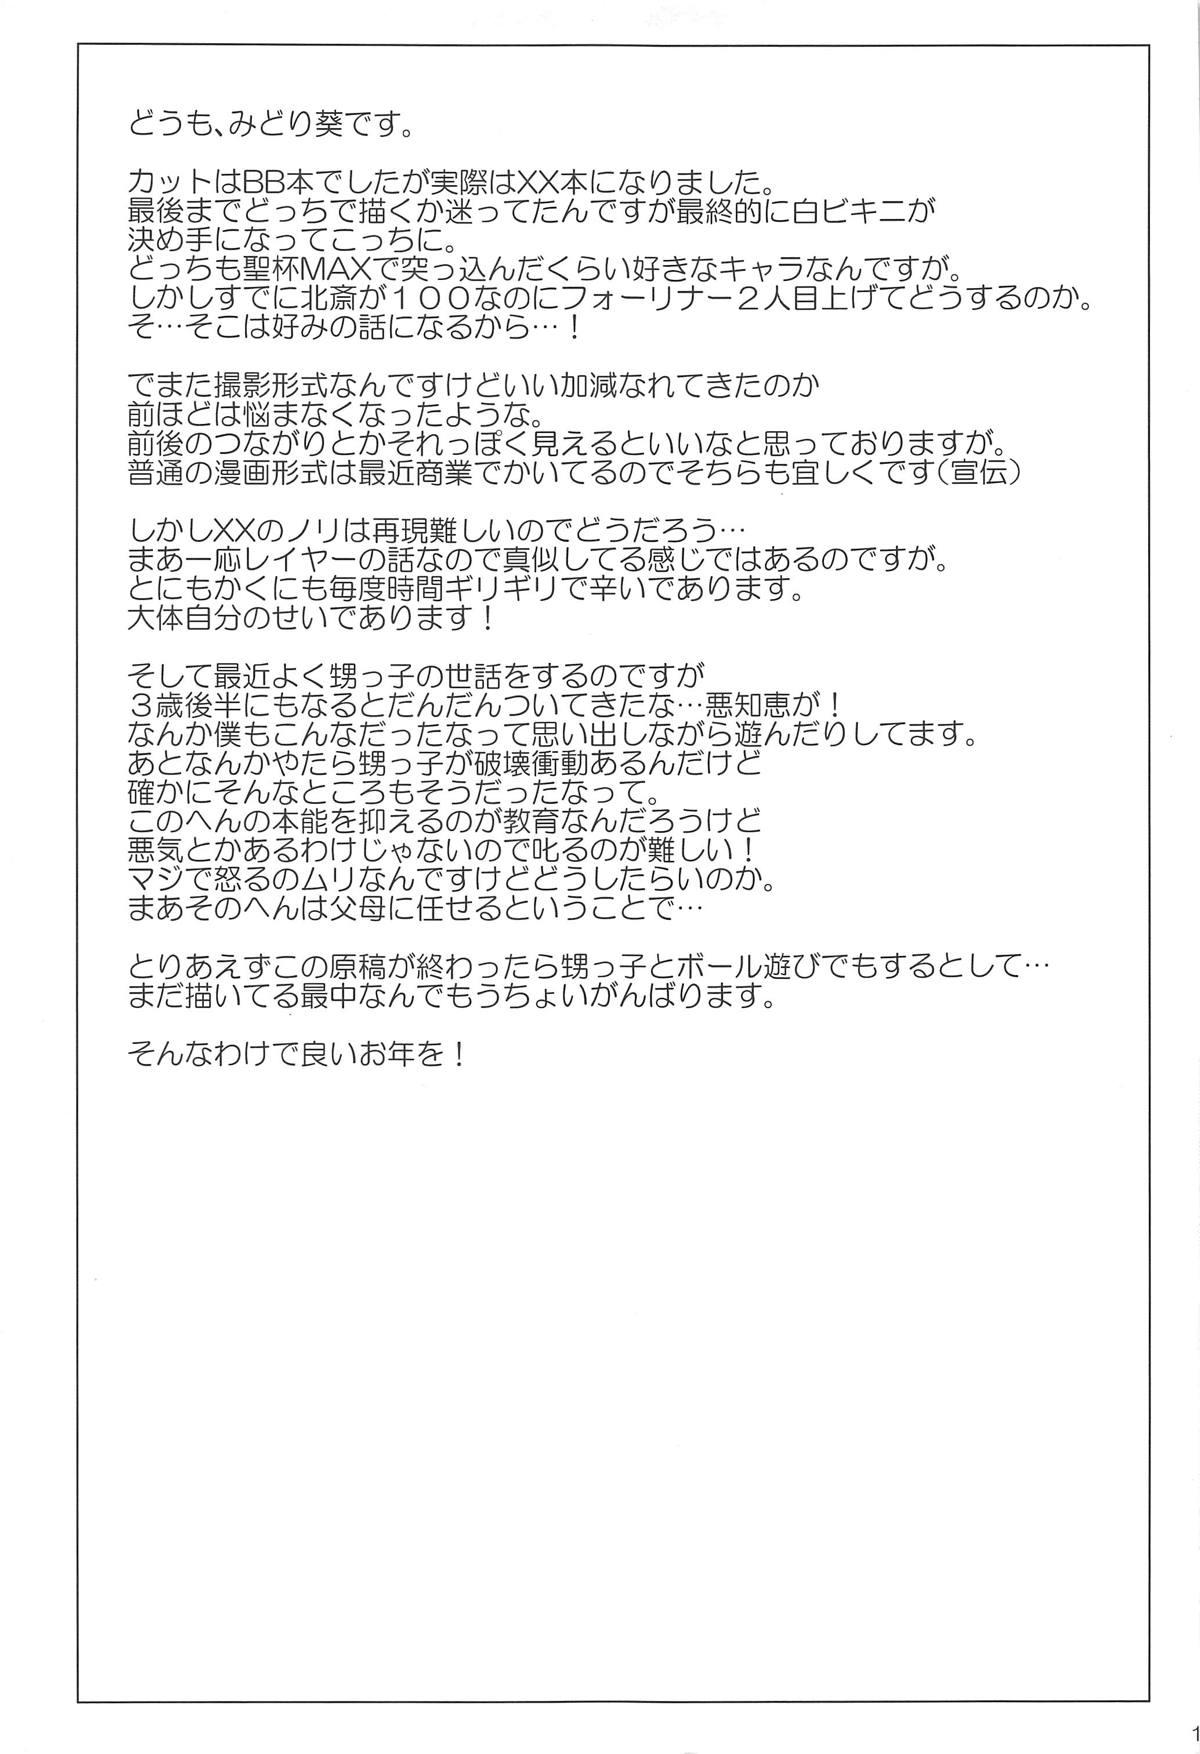 Beit Kankaku de Yarasete Kureru XX Layer-san 14